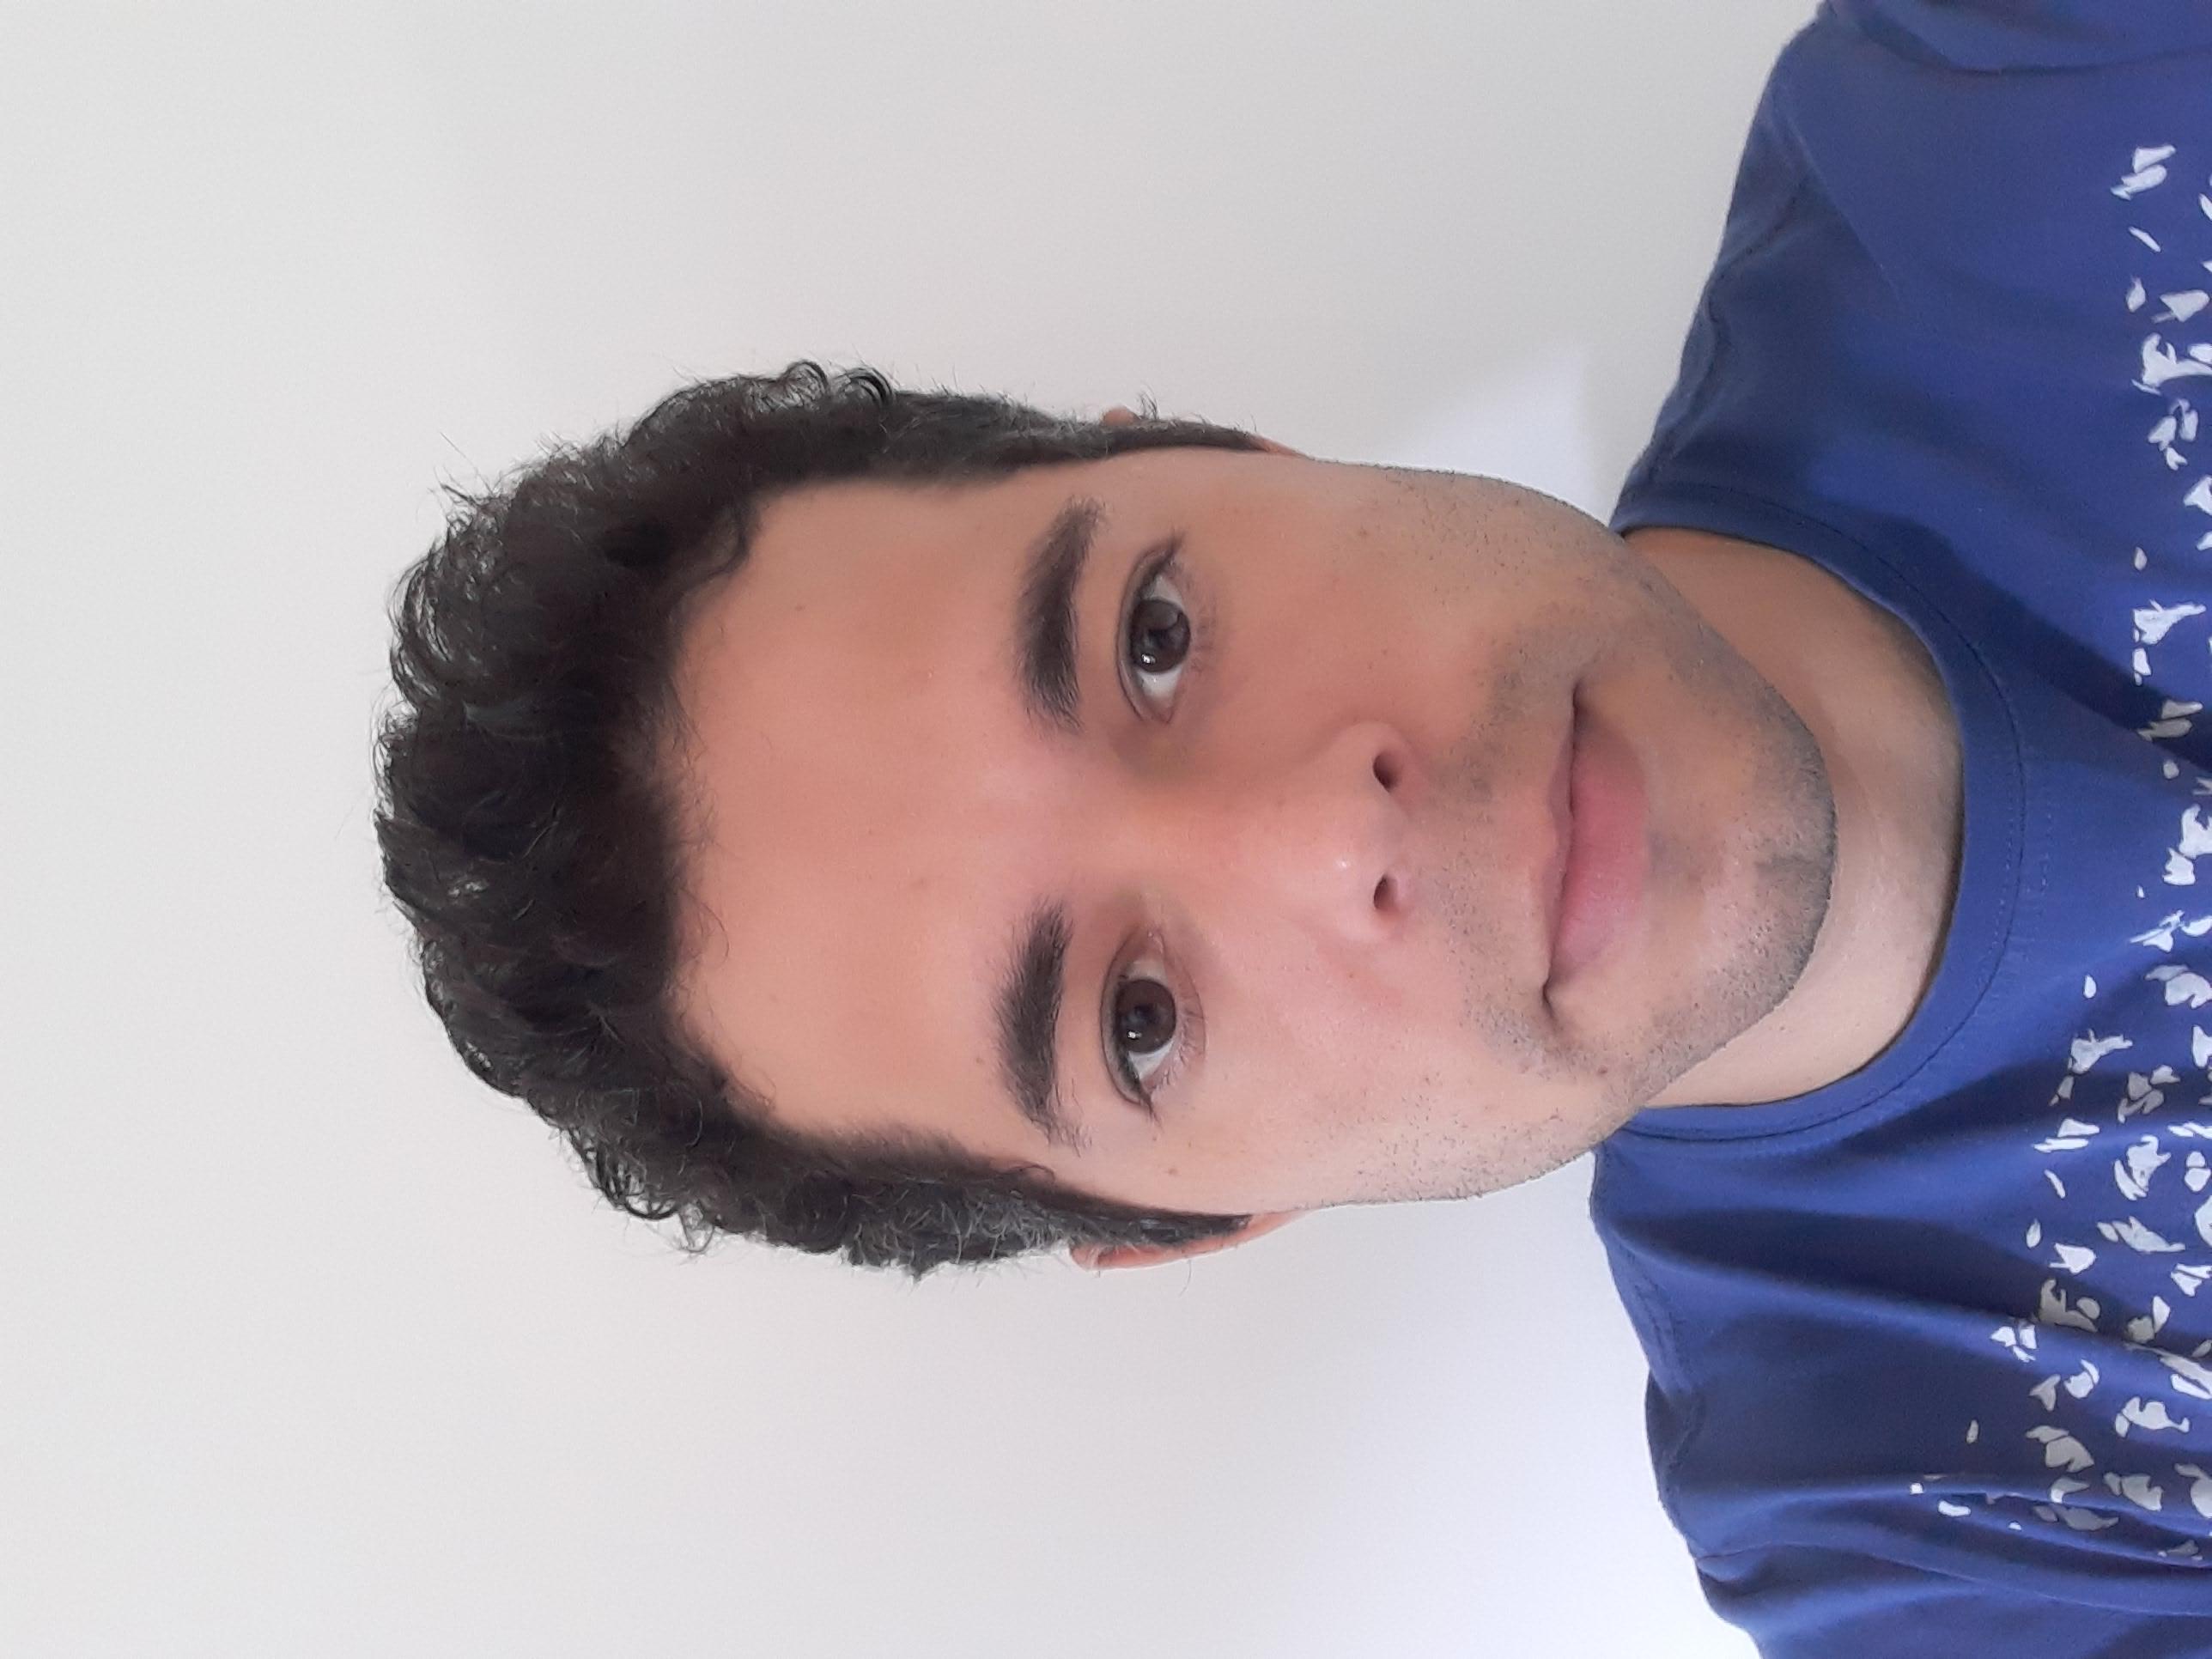 Francisco Pires